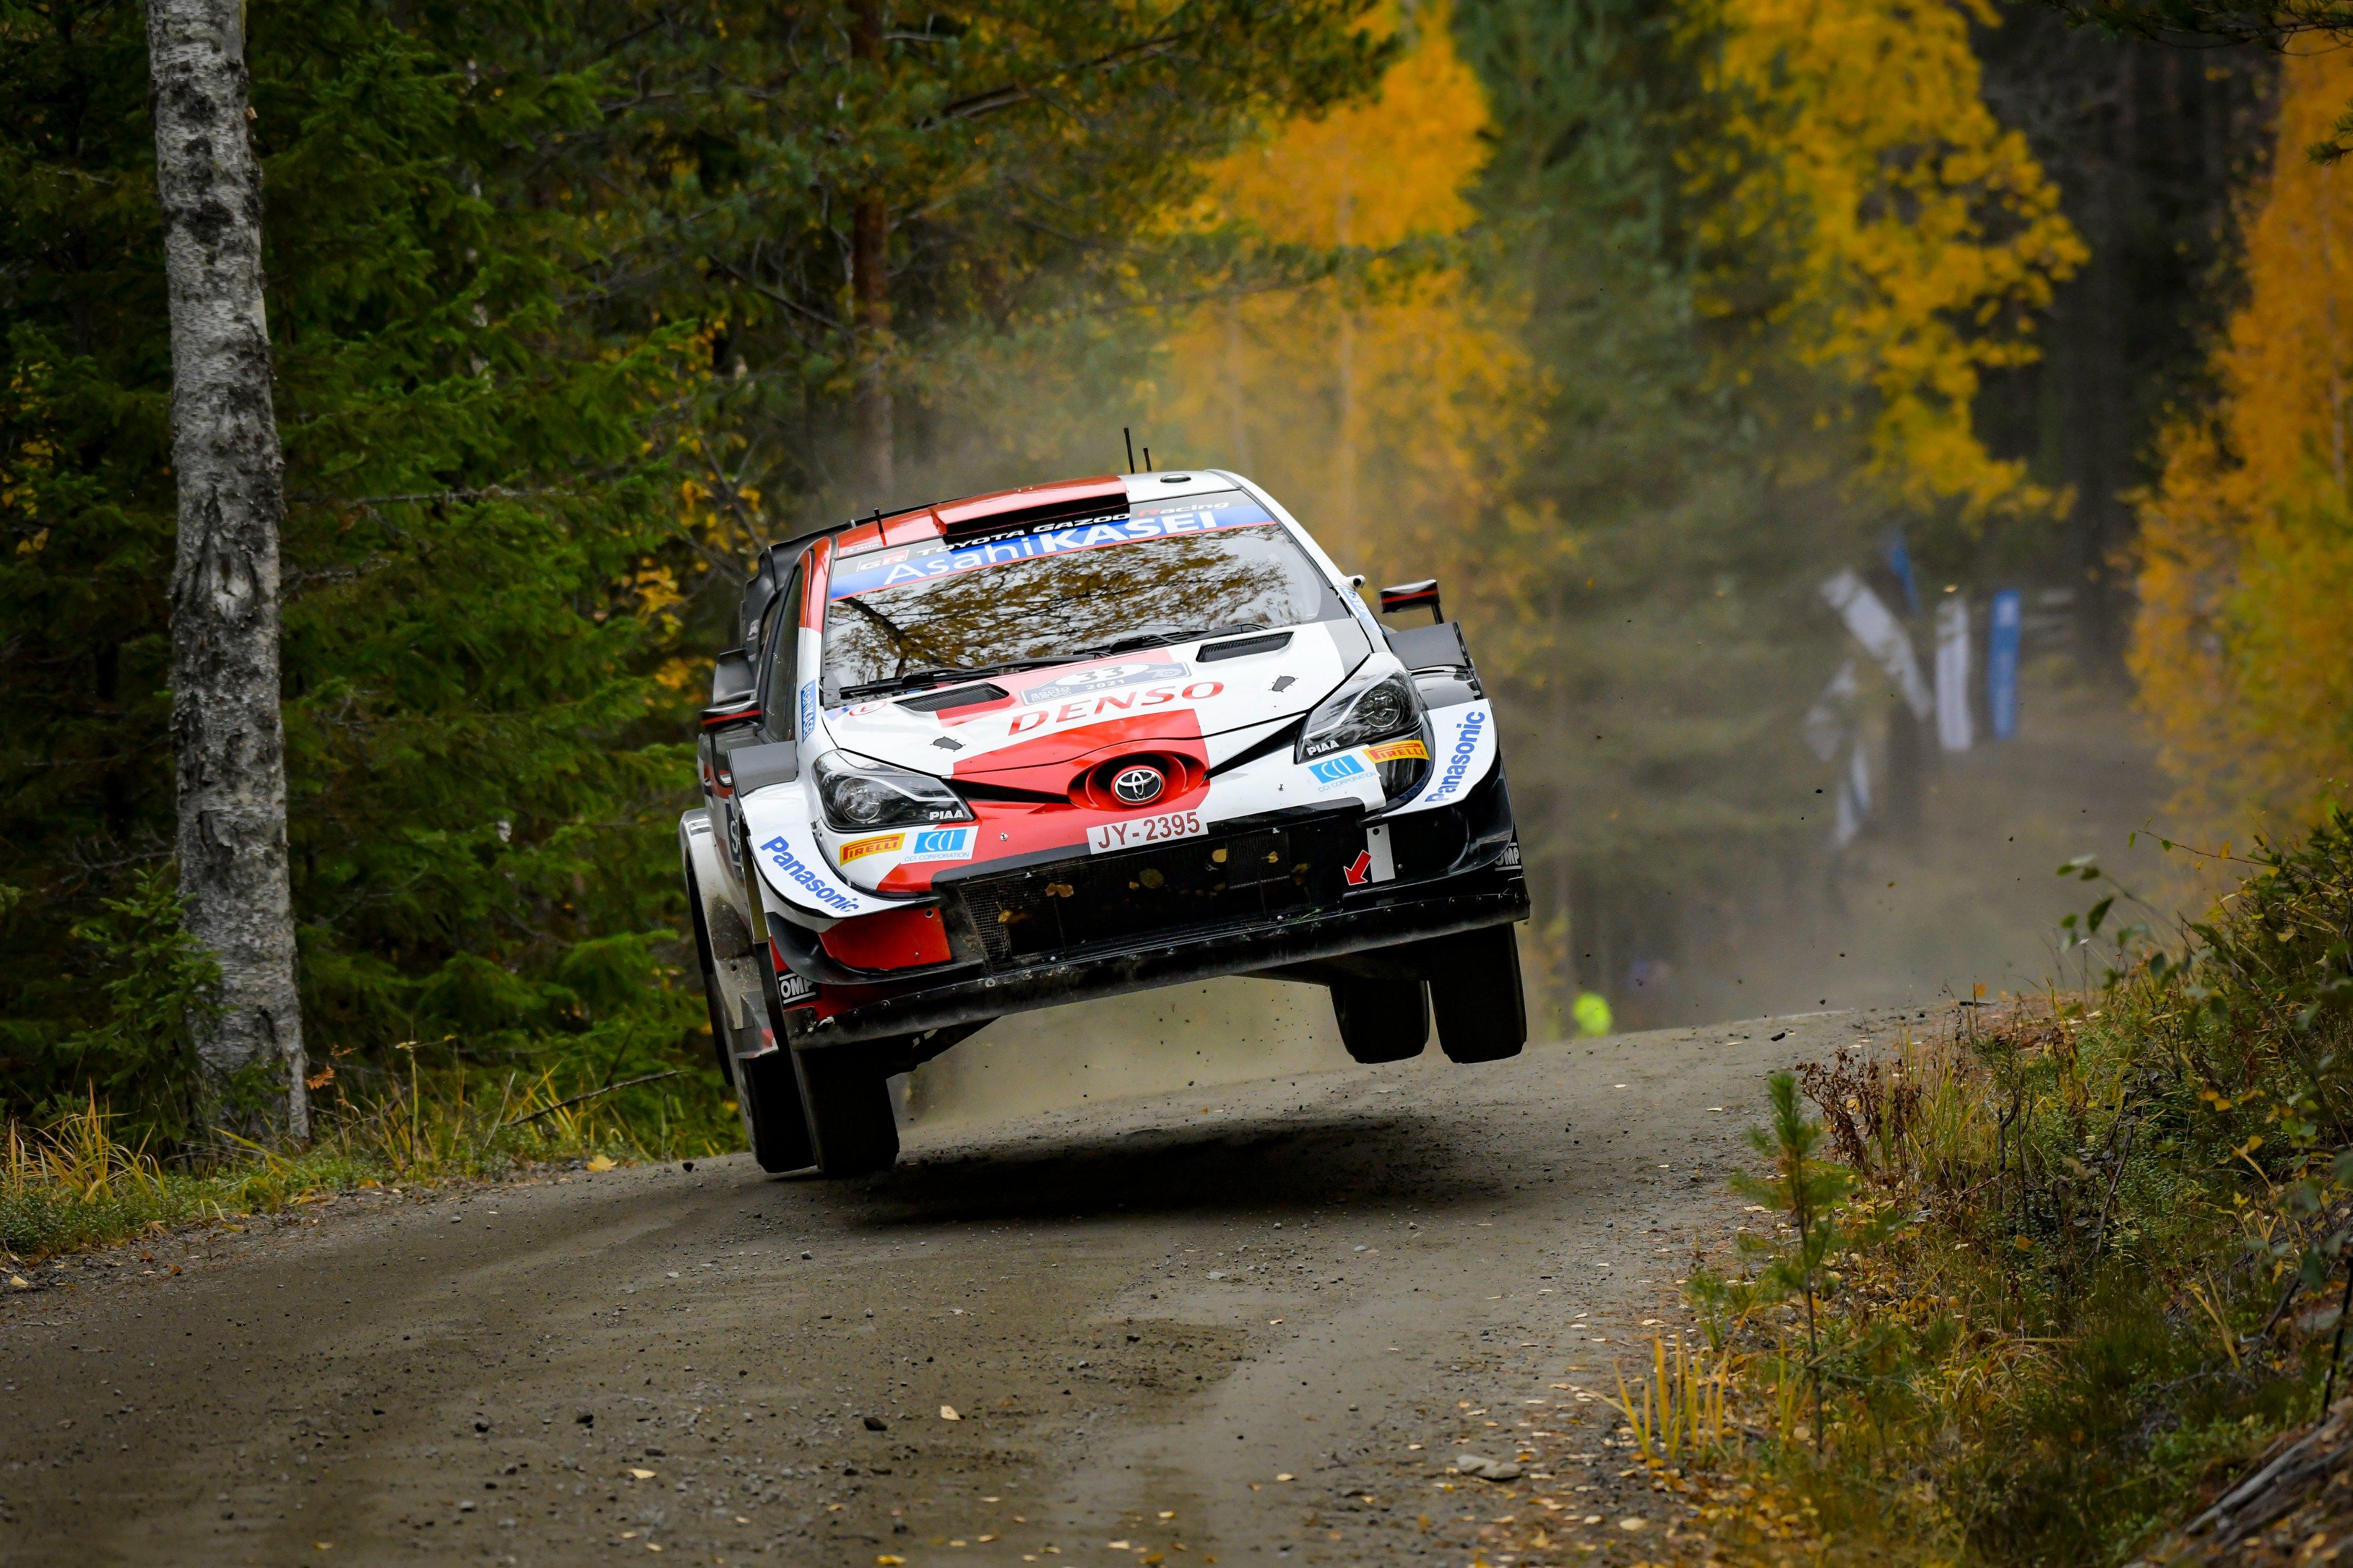 WRC: 70º SECTO Rally Finland [1-3 Octubre] - Página 3 FAwv9bJX0AQIJWj?format=jpg&name=4096x4096